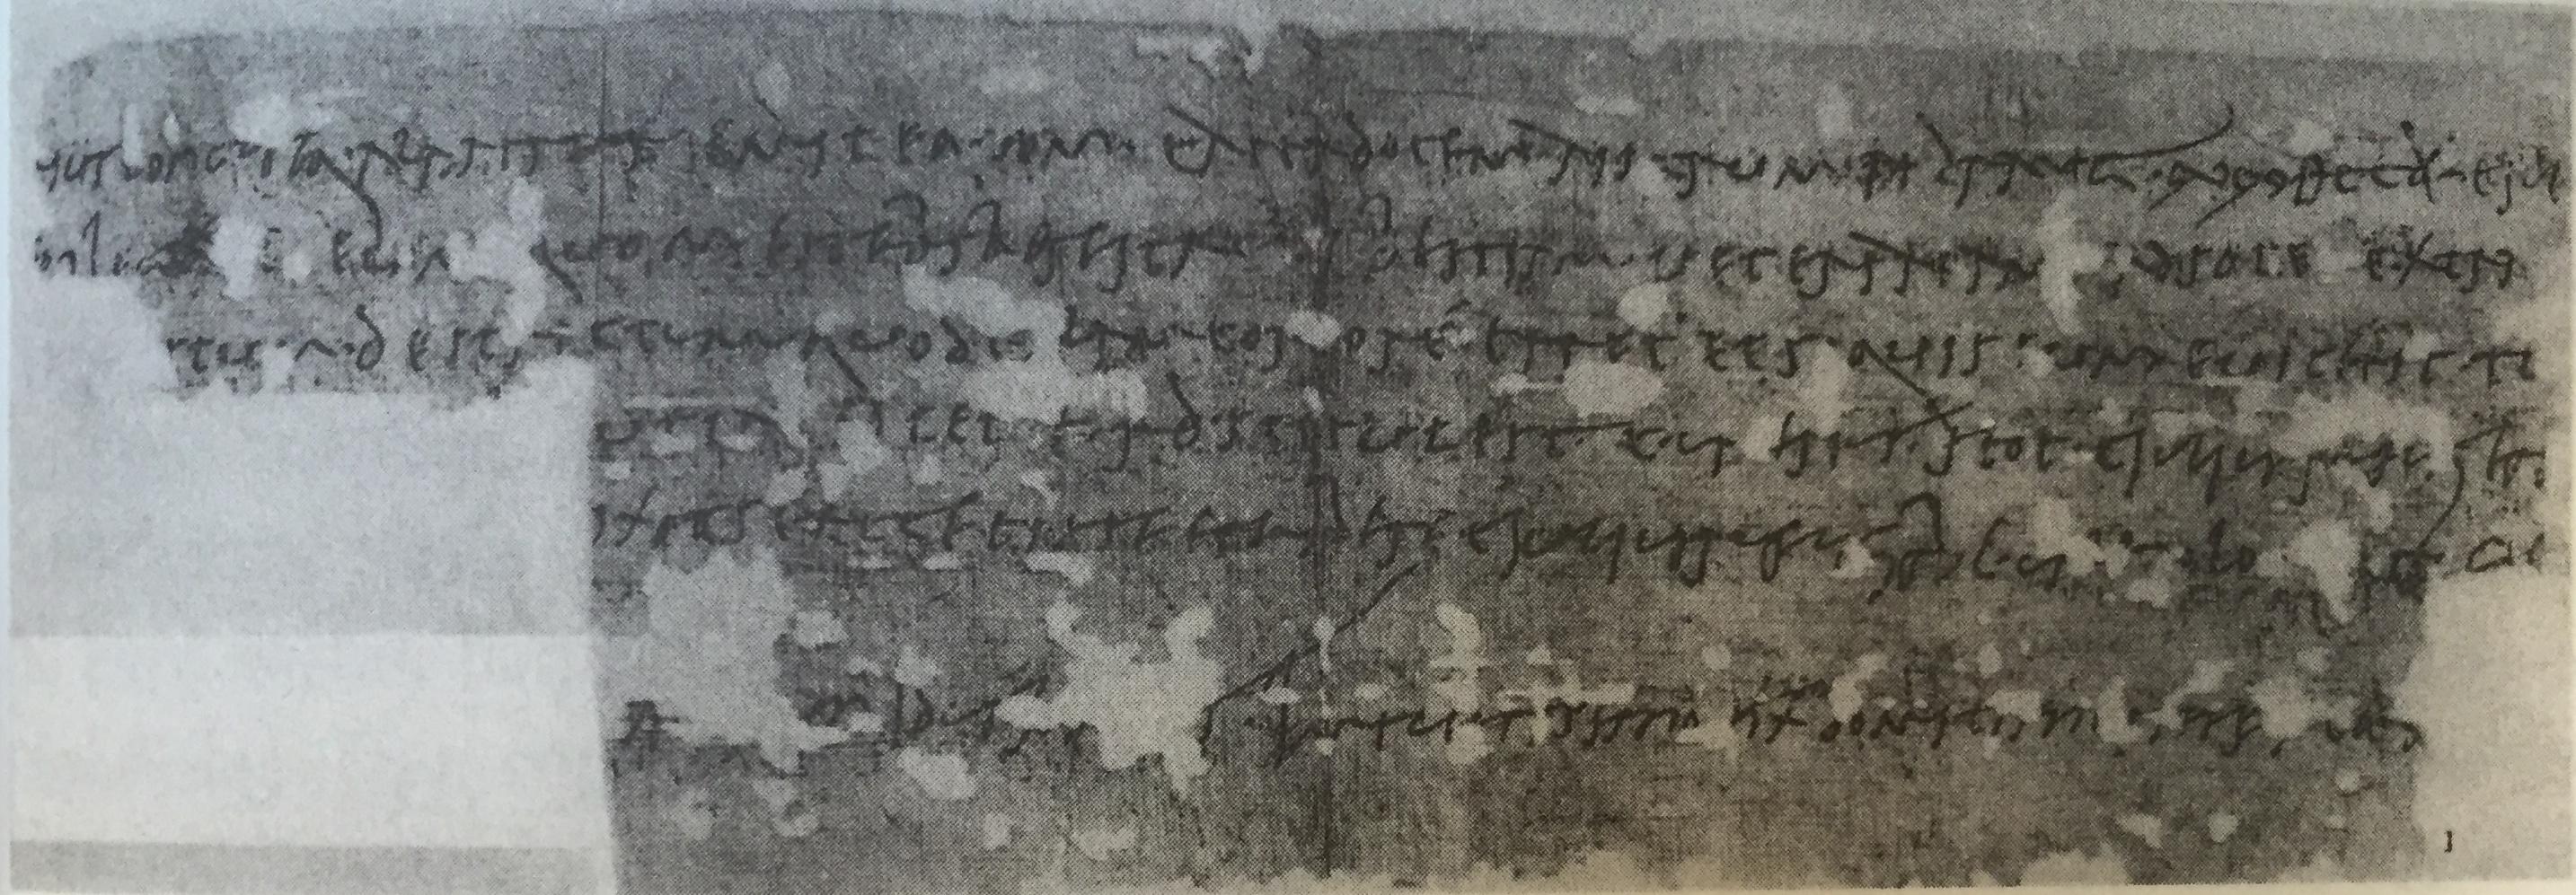 PSI VI 729, Horse sales contract. Old Roman Cursive characteristic of the era (77CE). Photo: Biblioteca Medicea Laurenziana, Florence.